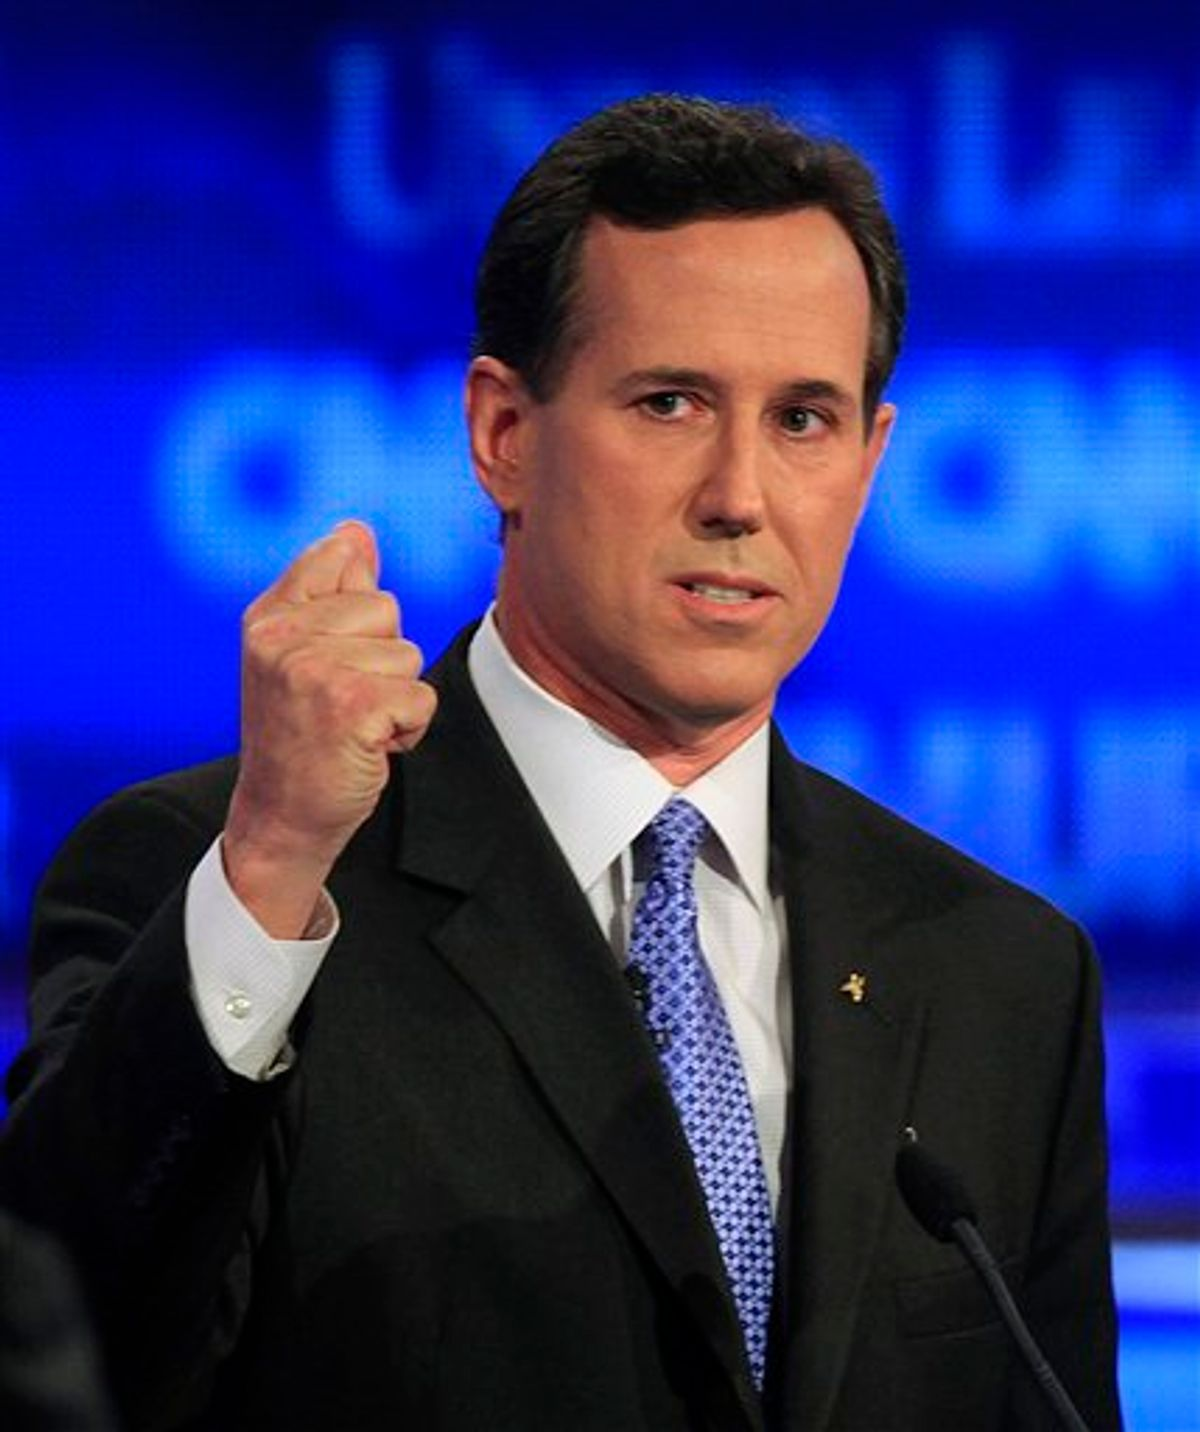 Former Pennsylvania Sen. Rick Santorum speaks during the first New Hampshire Republican presidential debate at St. Anselm College in Manchester, N.H., Monday, June 13, 2011. (AP Photo/Jim Cole) (AP)